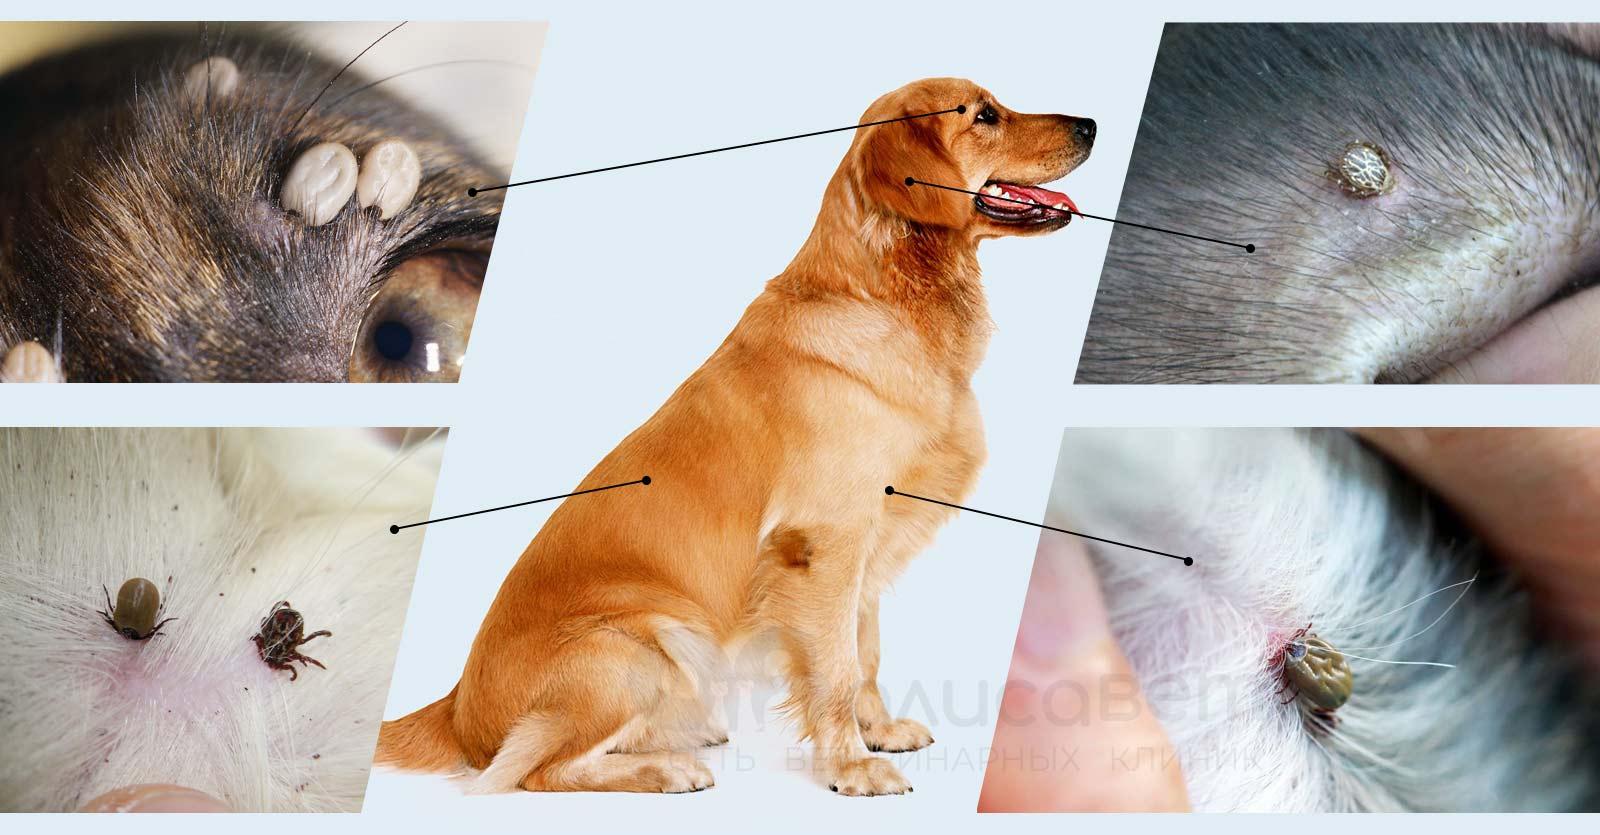 Пироплазмоз у собаки